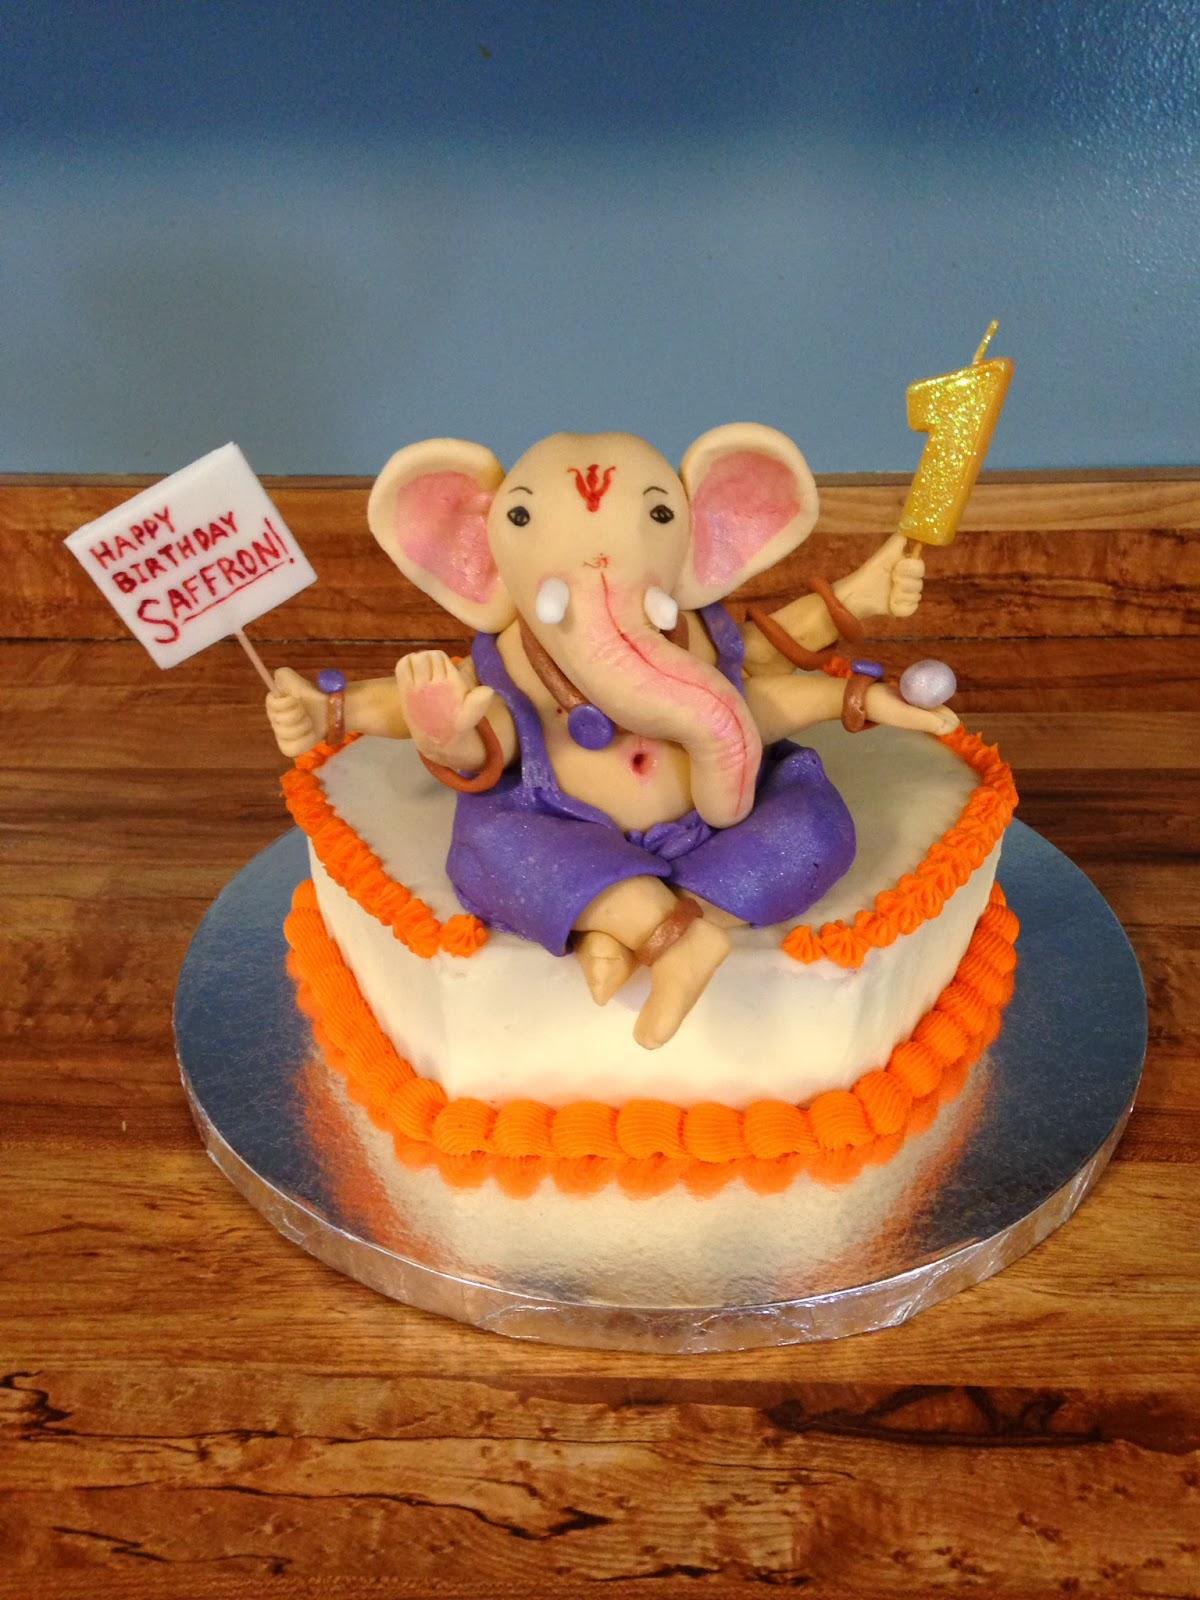 Ganesh Bday Cake Images : Something More...: SAFFY BIRTHDAY!